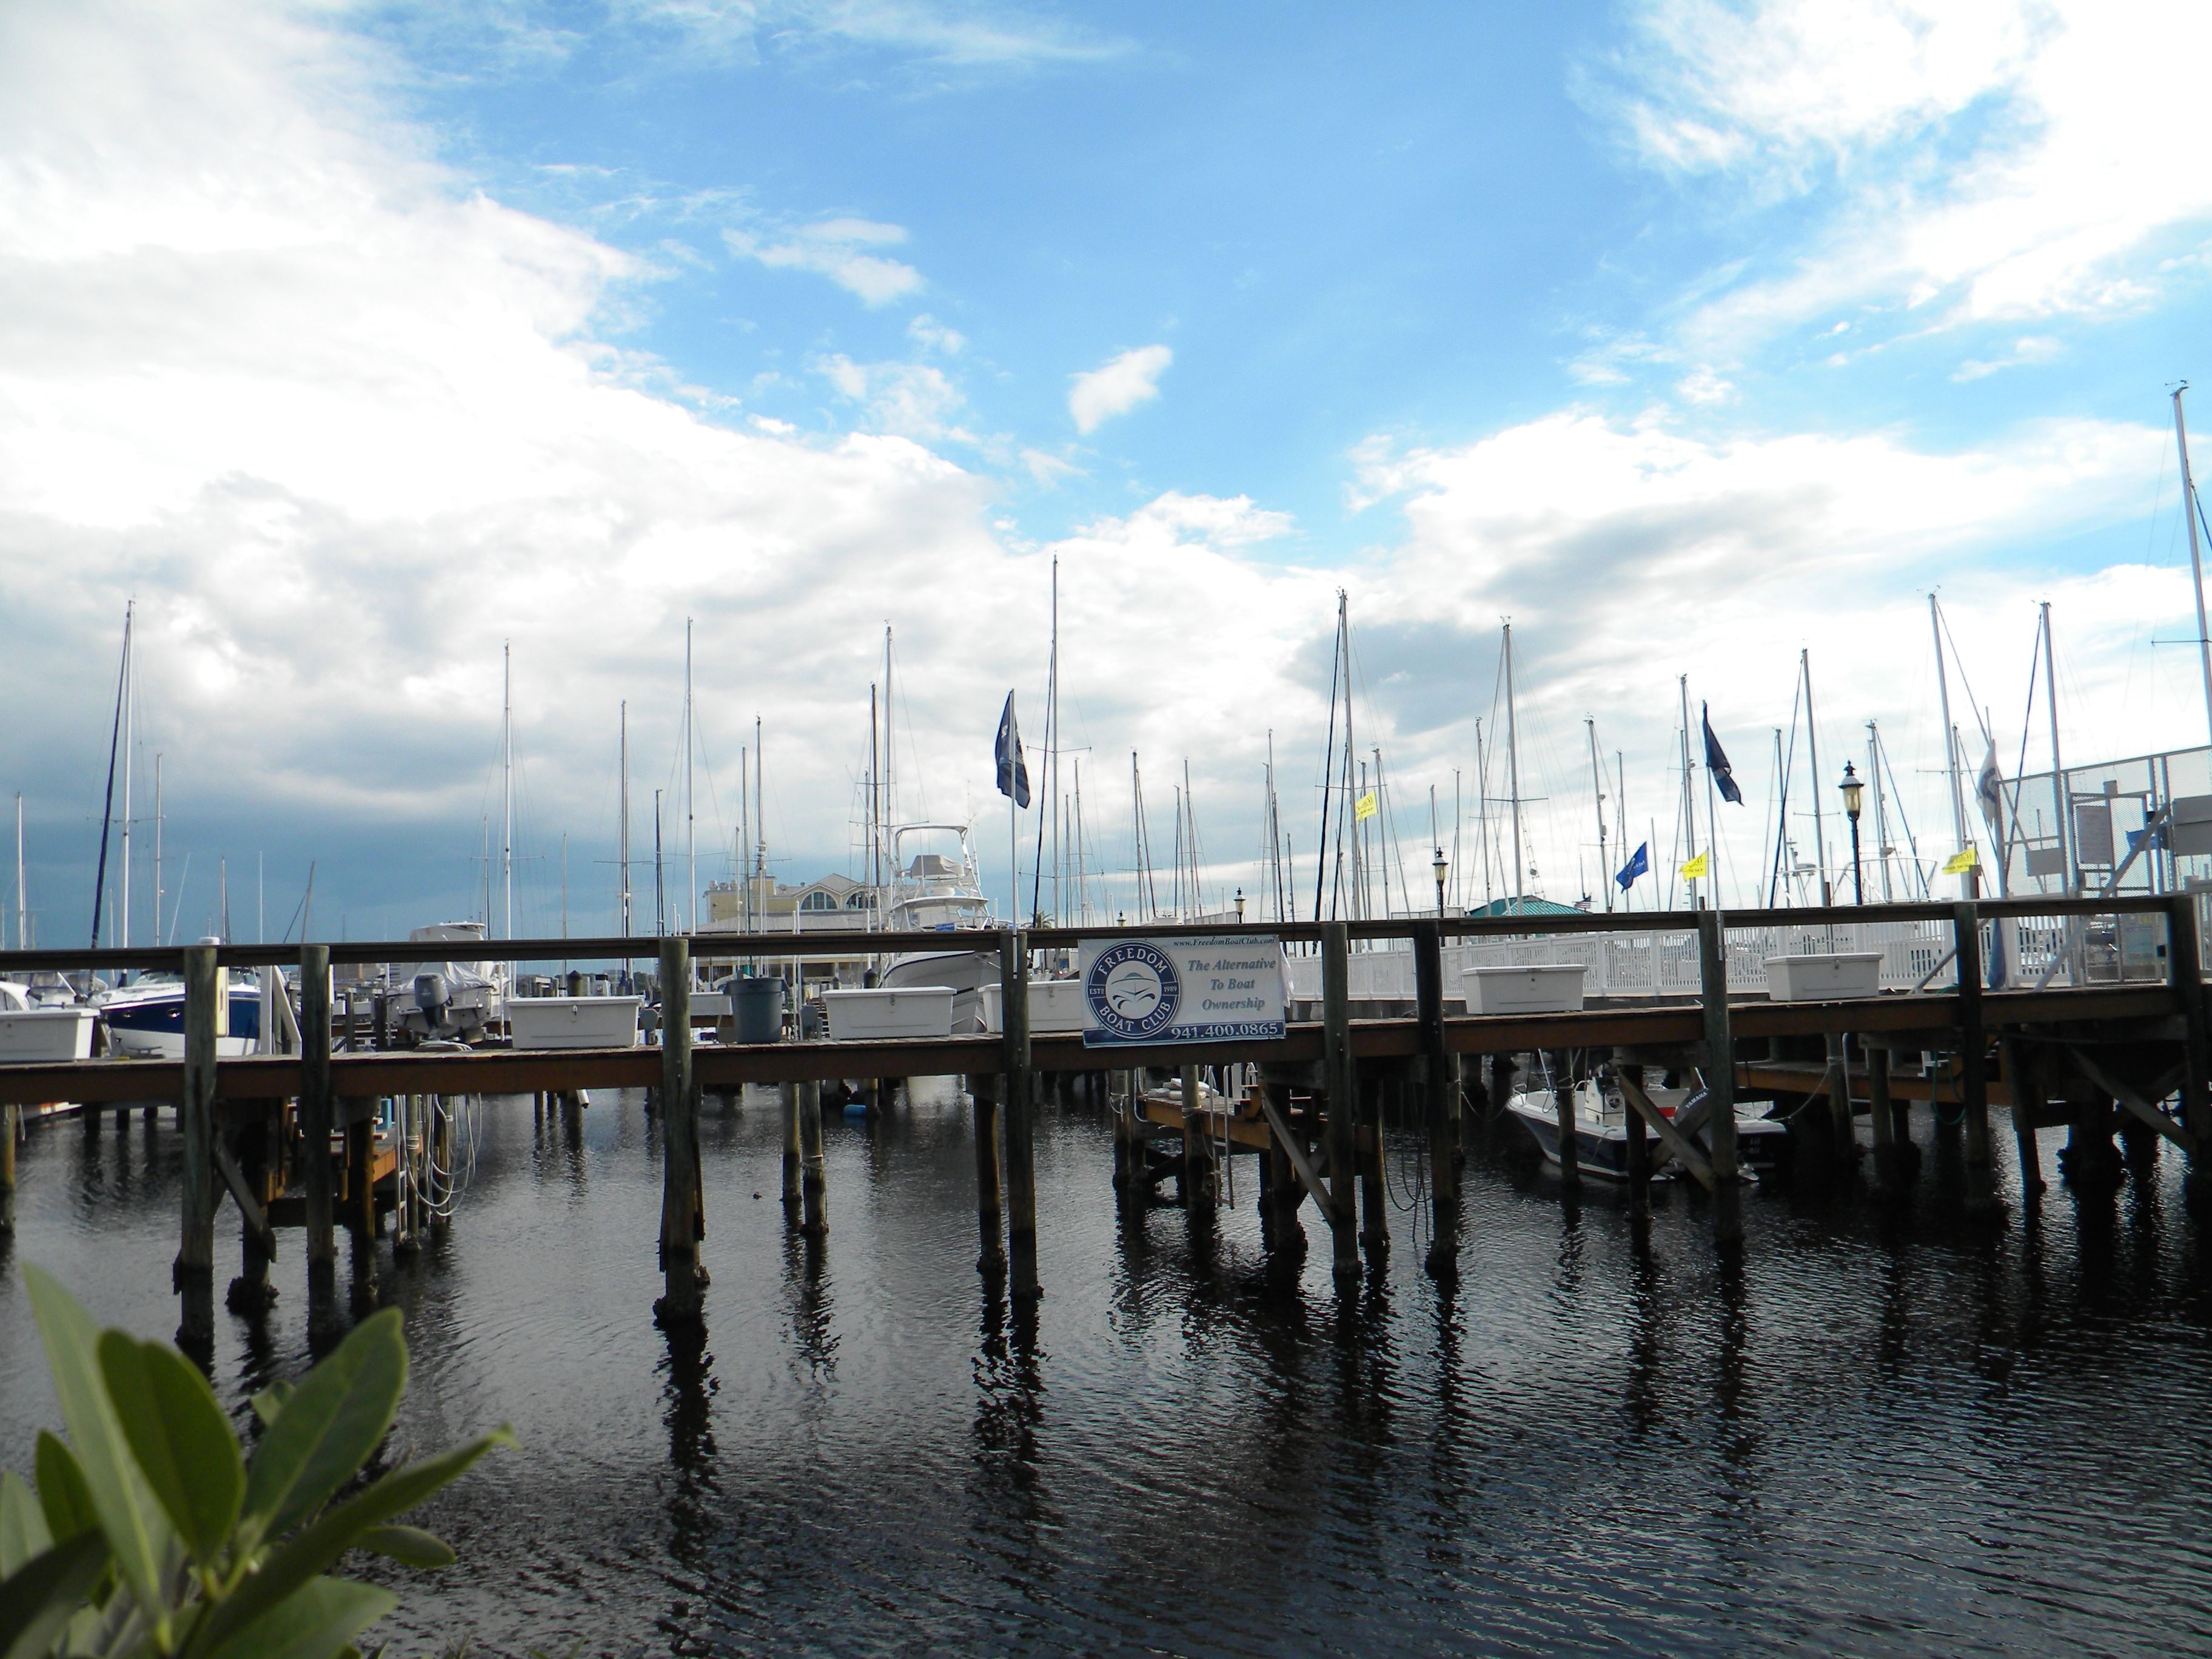 Freedom sailing. Florida's favorite live-aboard marina. Regatta Pointe Marina, Palmetto FL